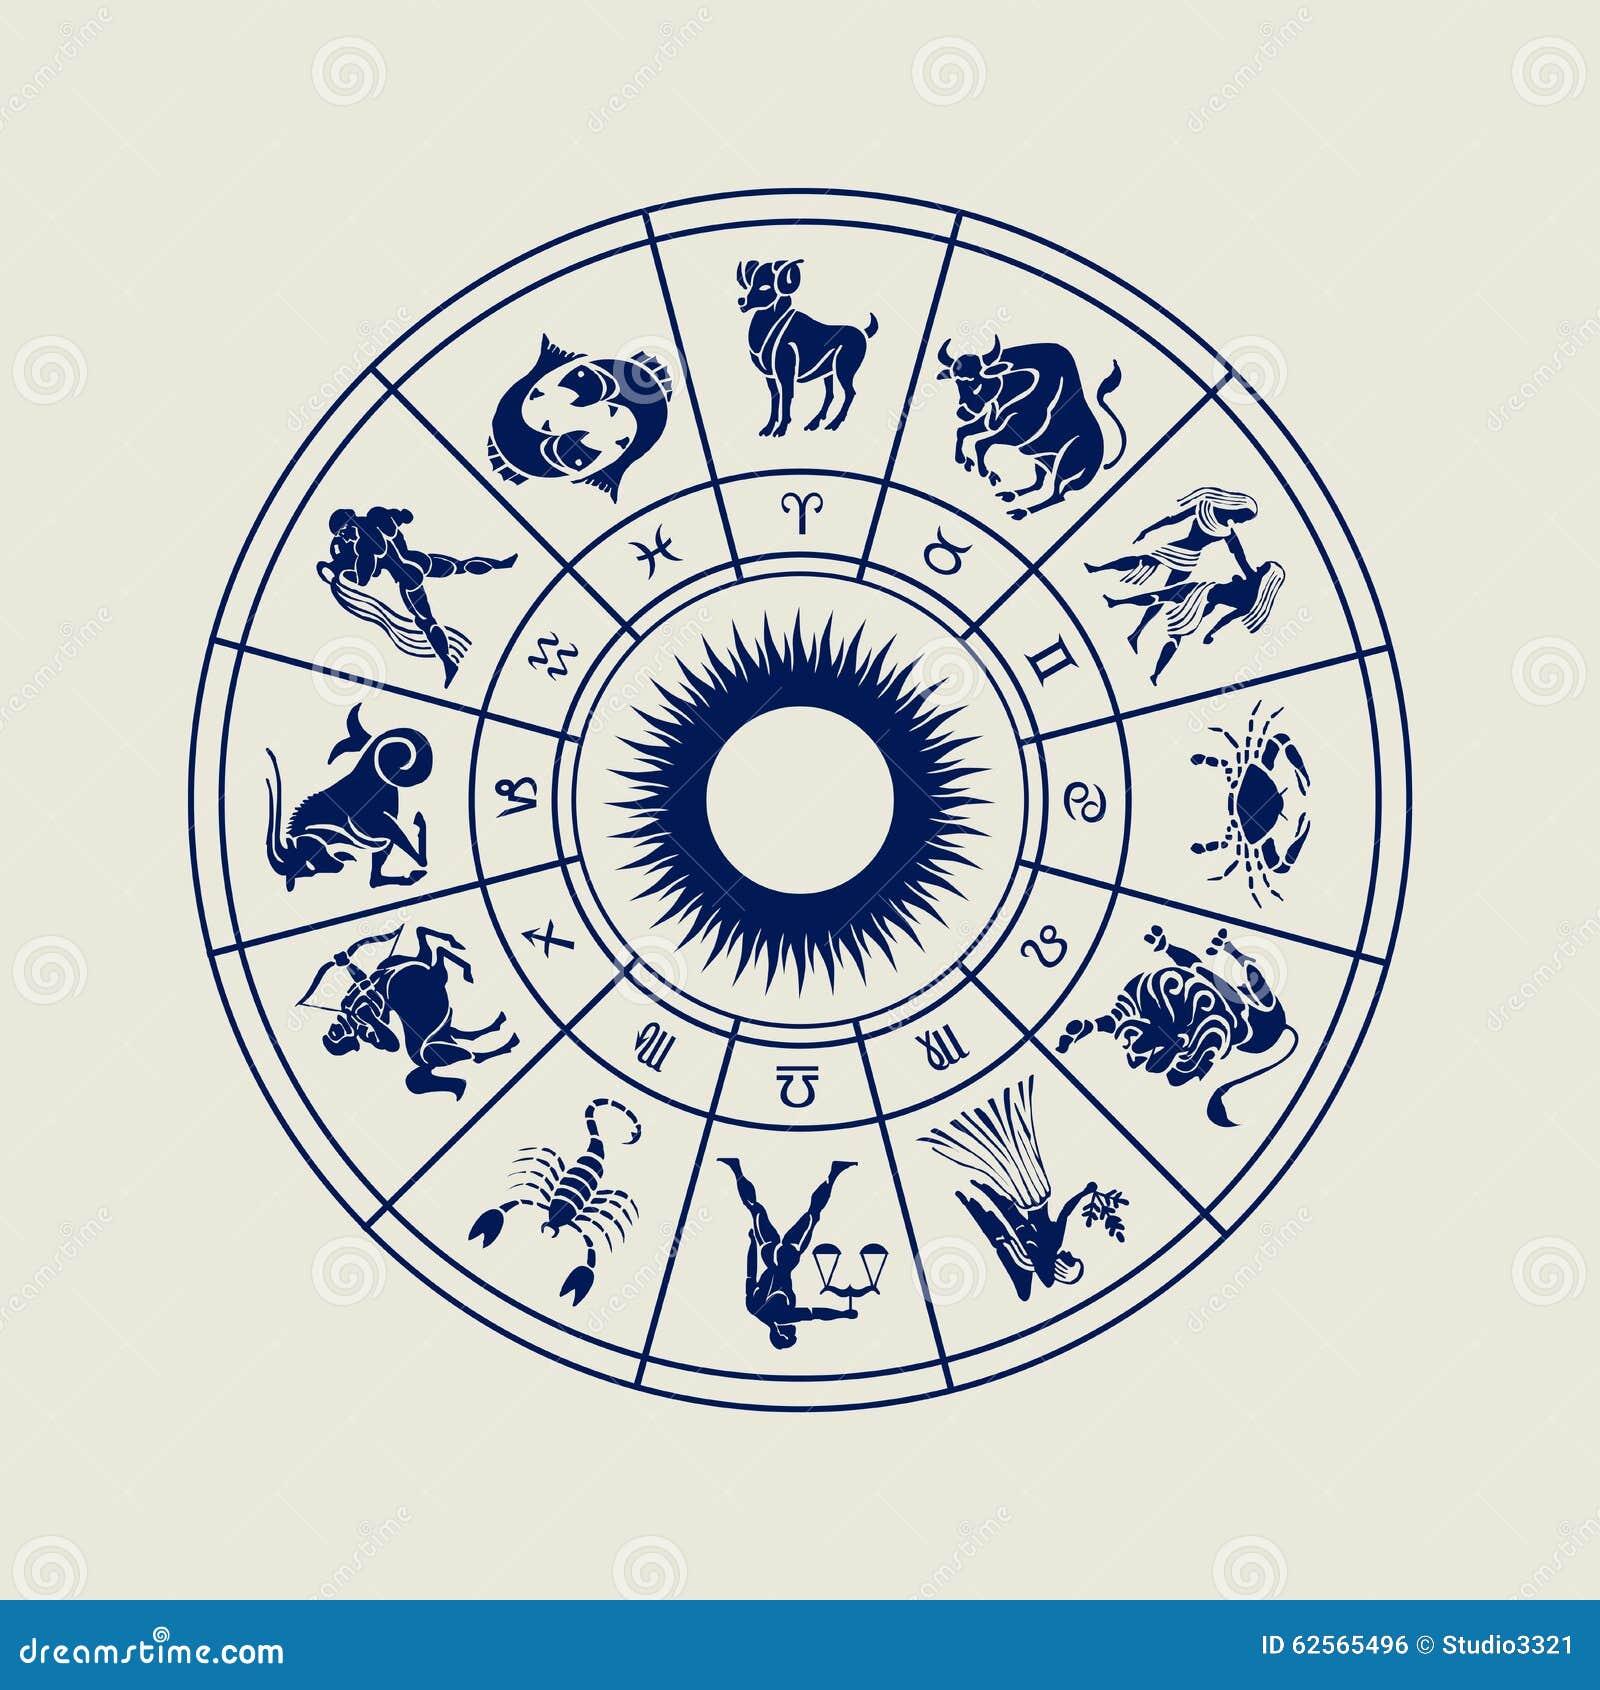 Horoscope Wheel Of Zodiac Signs Stock Illustration Illustration Of